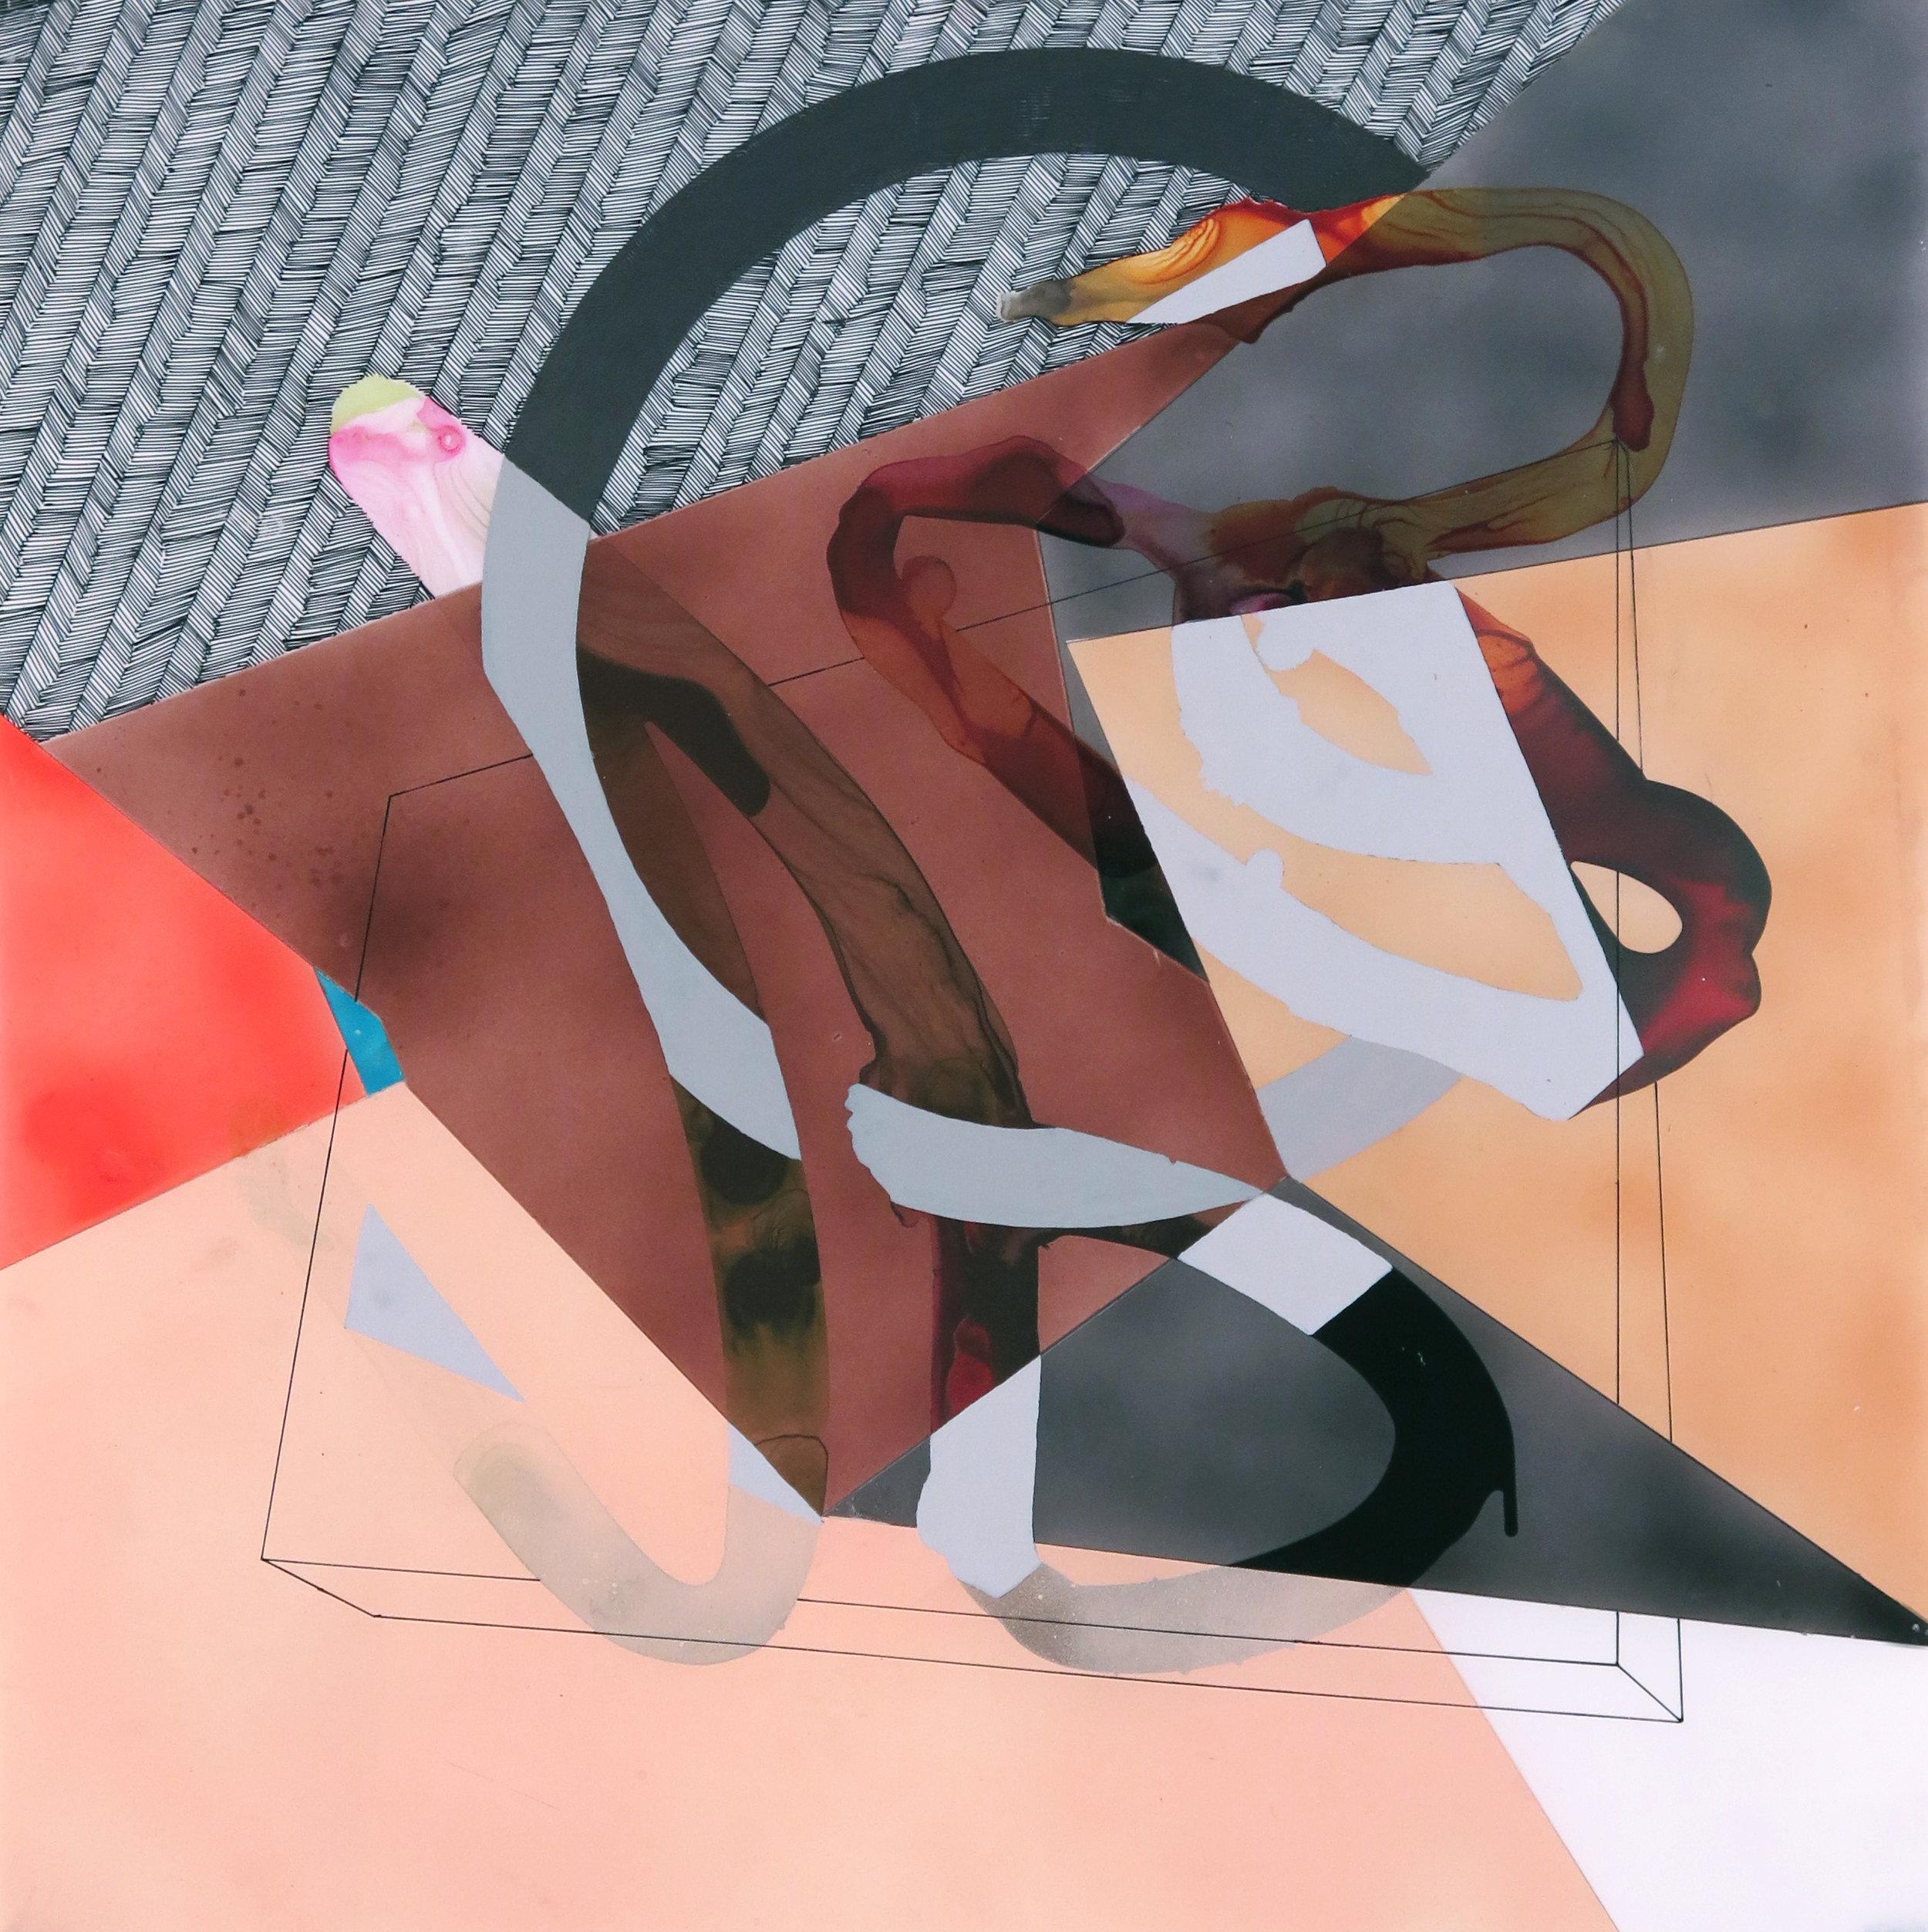 Poetics of a Hidden Geometric Plane, XXVII